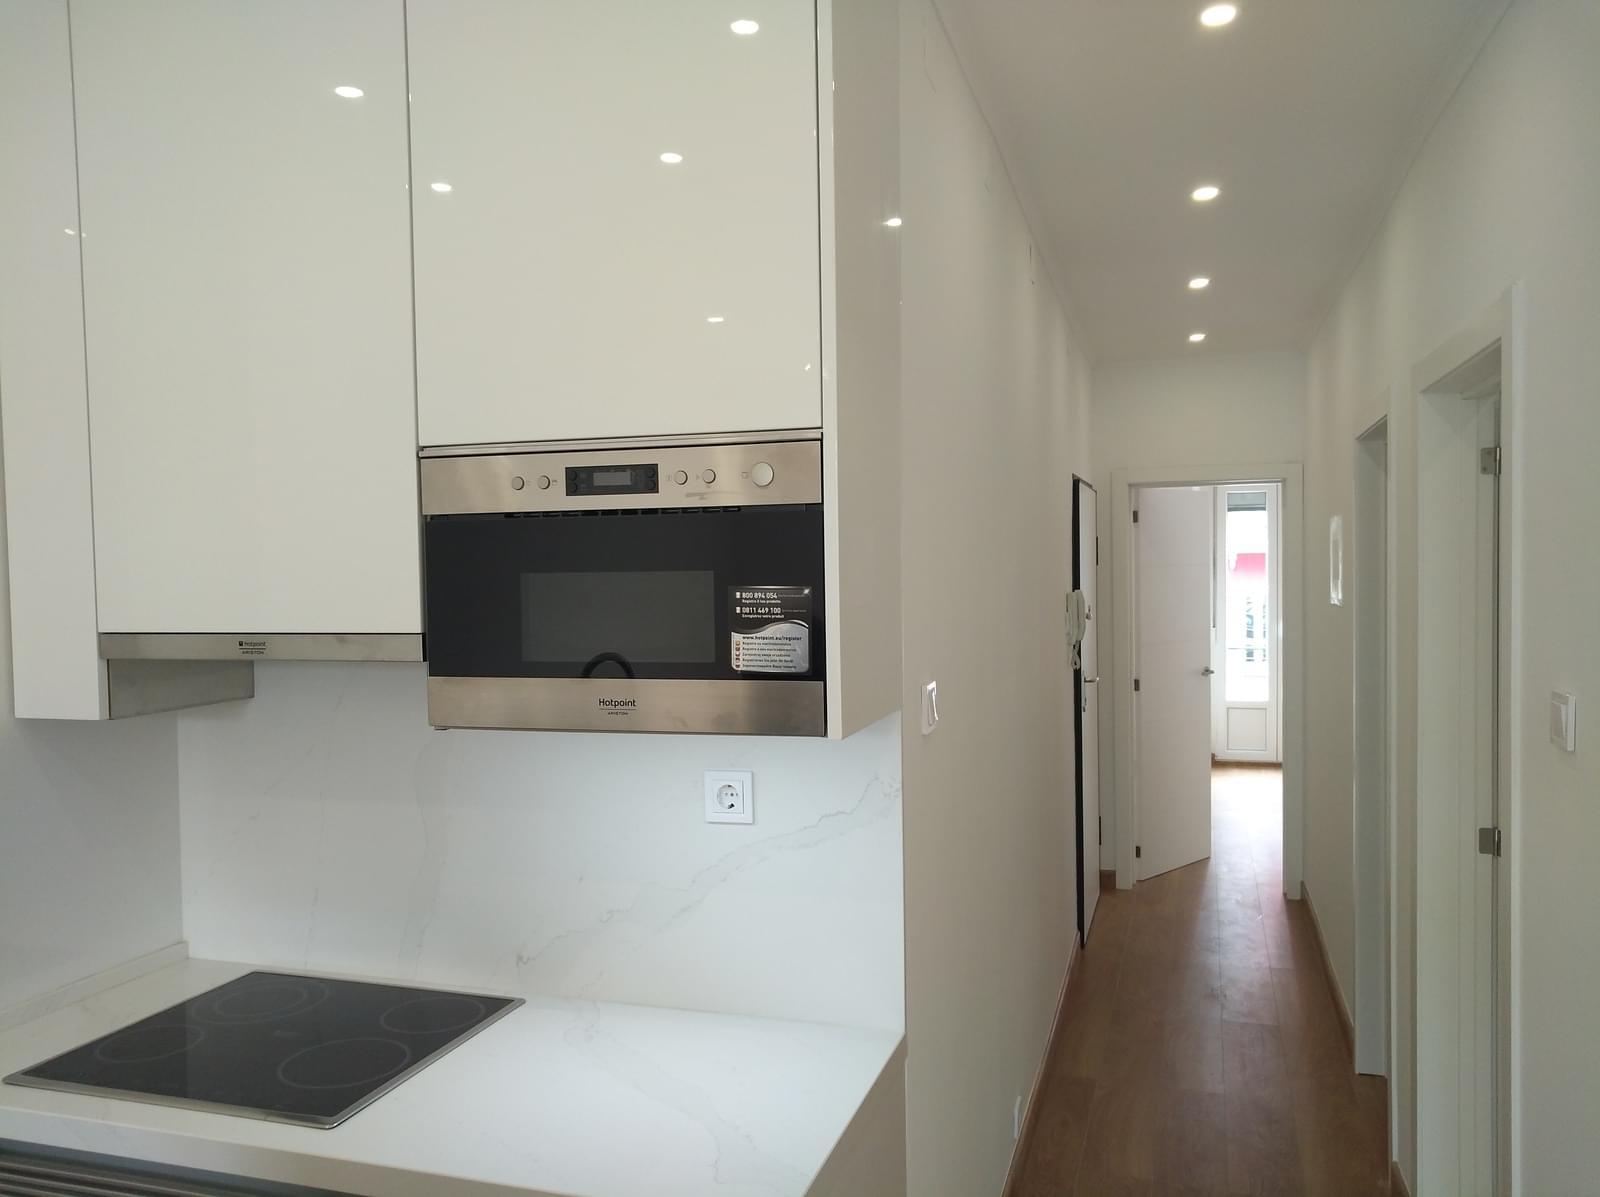 pf17316-apartamento-t2-lisboa-3c66b0ce-da0d-4784-9ae2-c94197cfa470